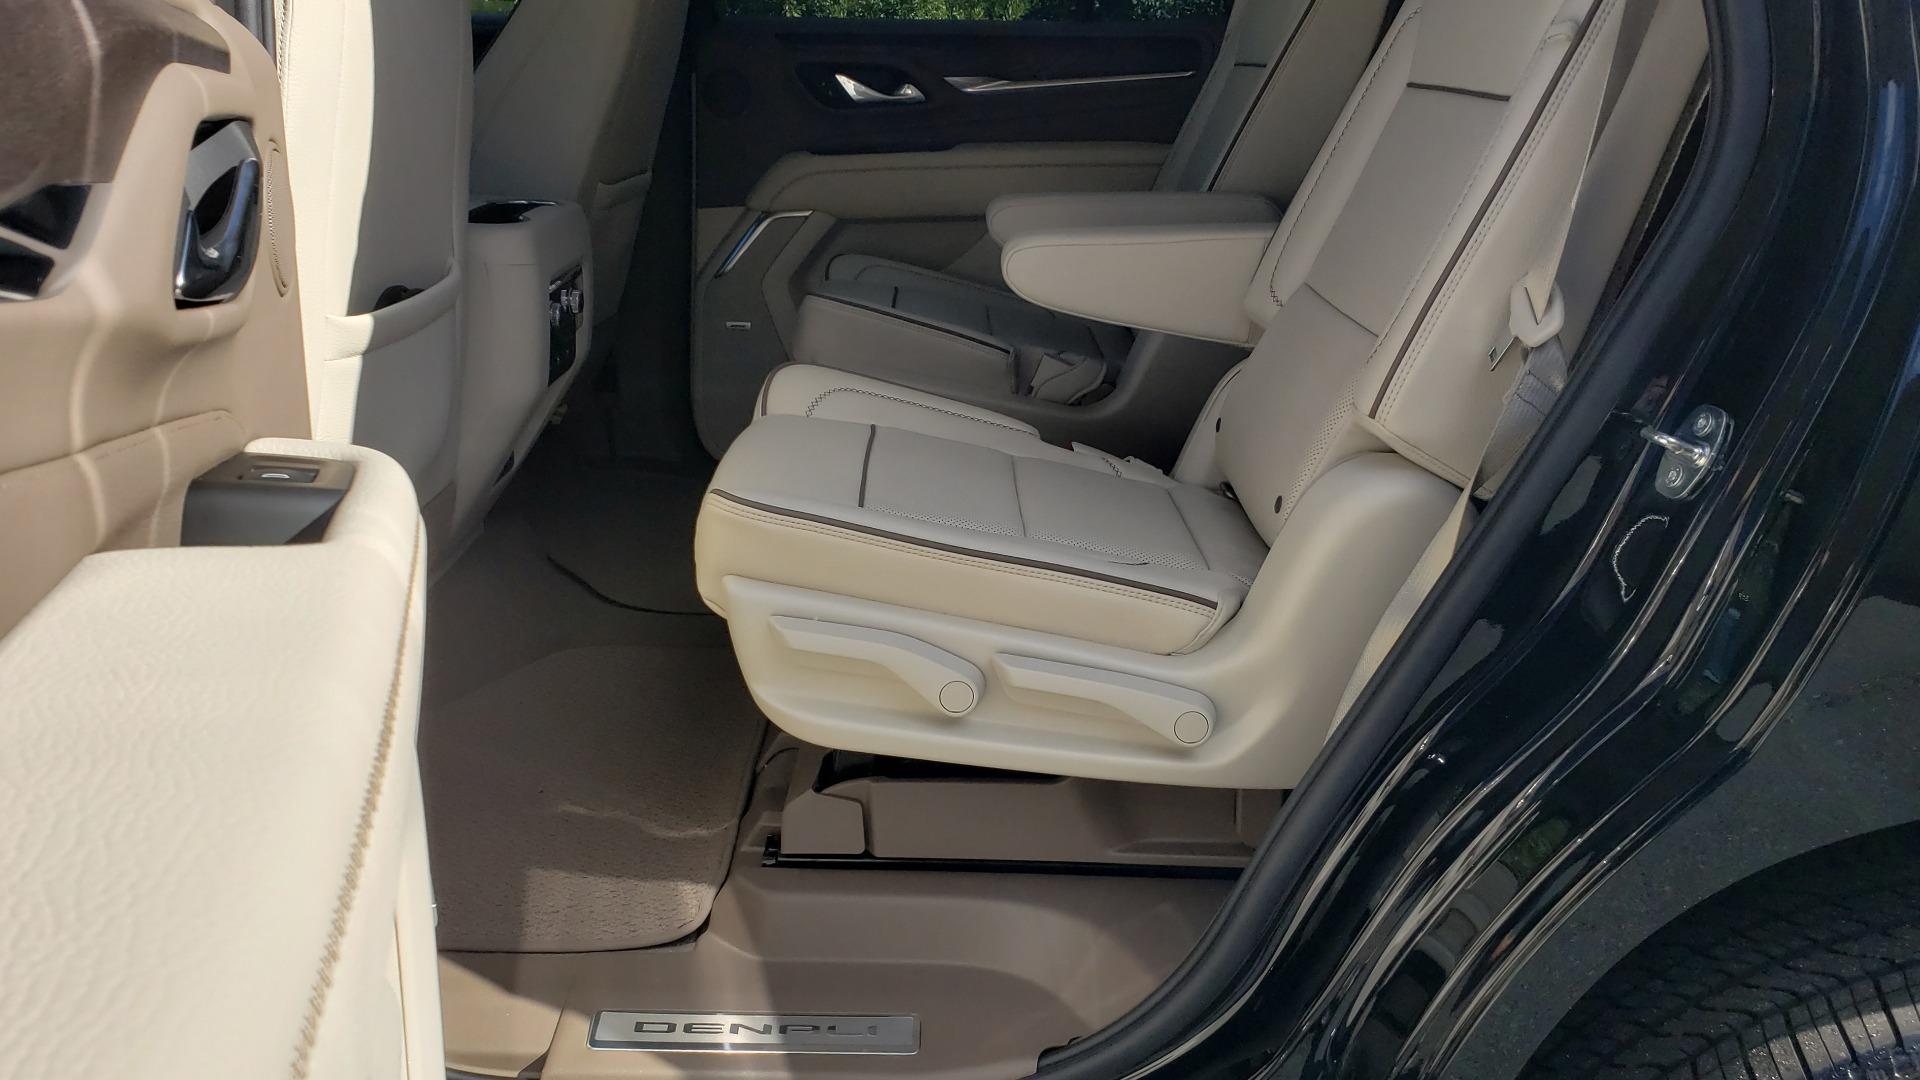 Used 2021 GMC YUKON DENALI PREMIUM 4WD / NAV / ADVANCED TECH / ENTERTAINMENT for sale Sold at Formula Imports in Charlotte NC 28227 72